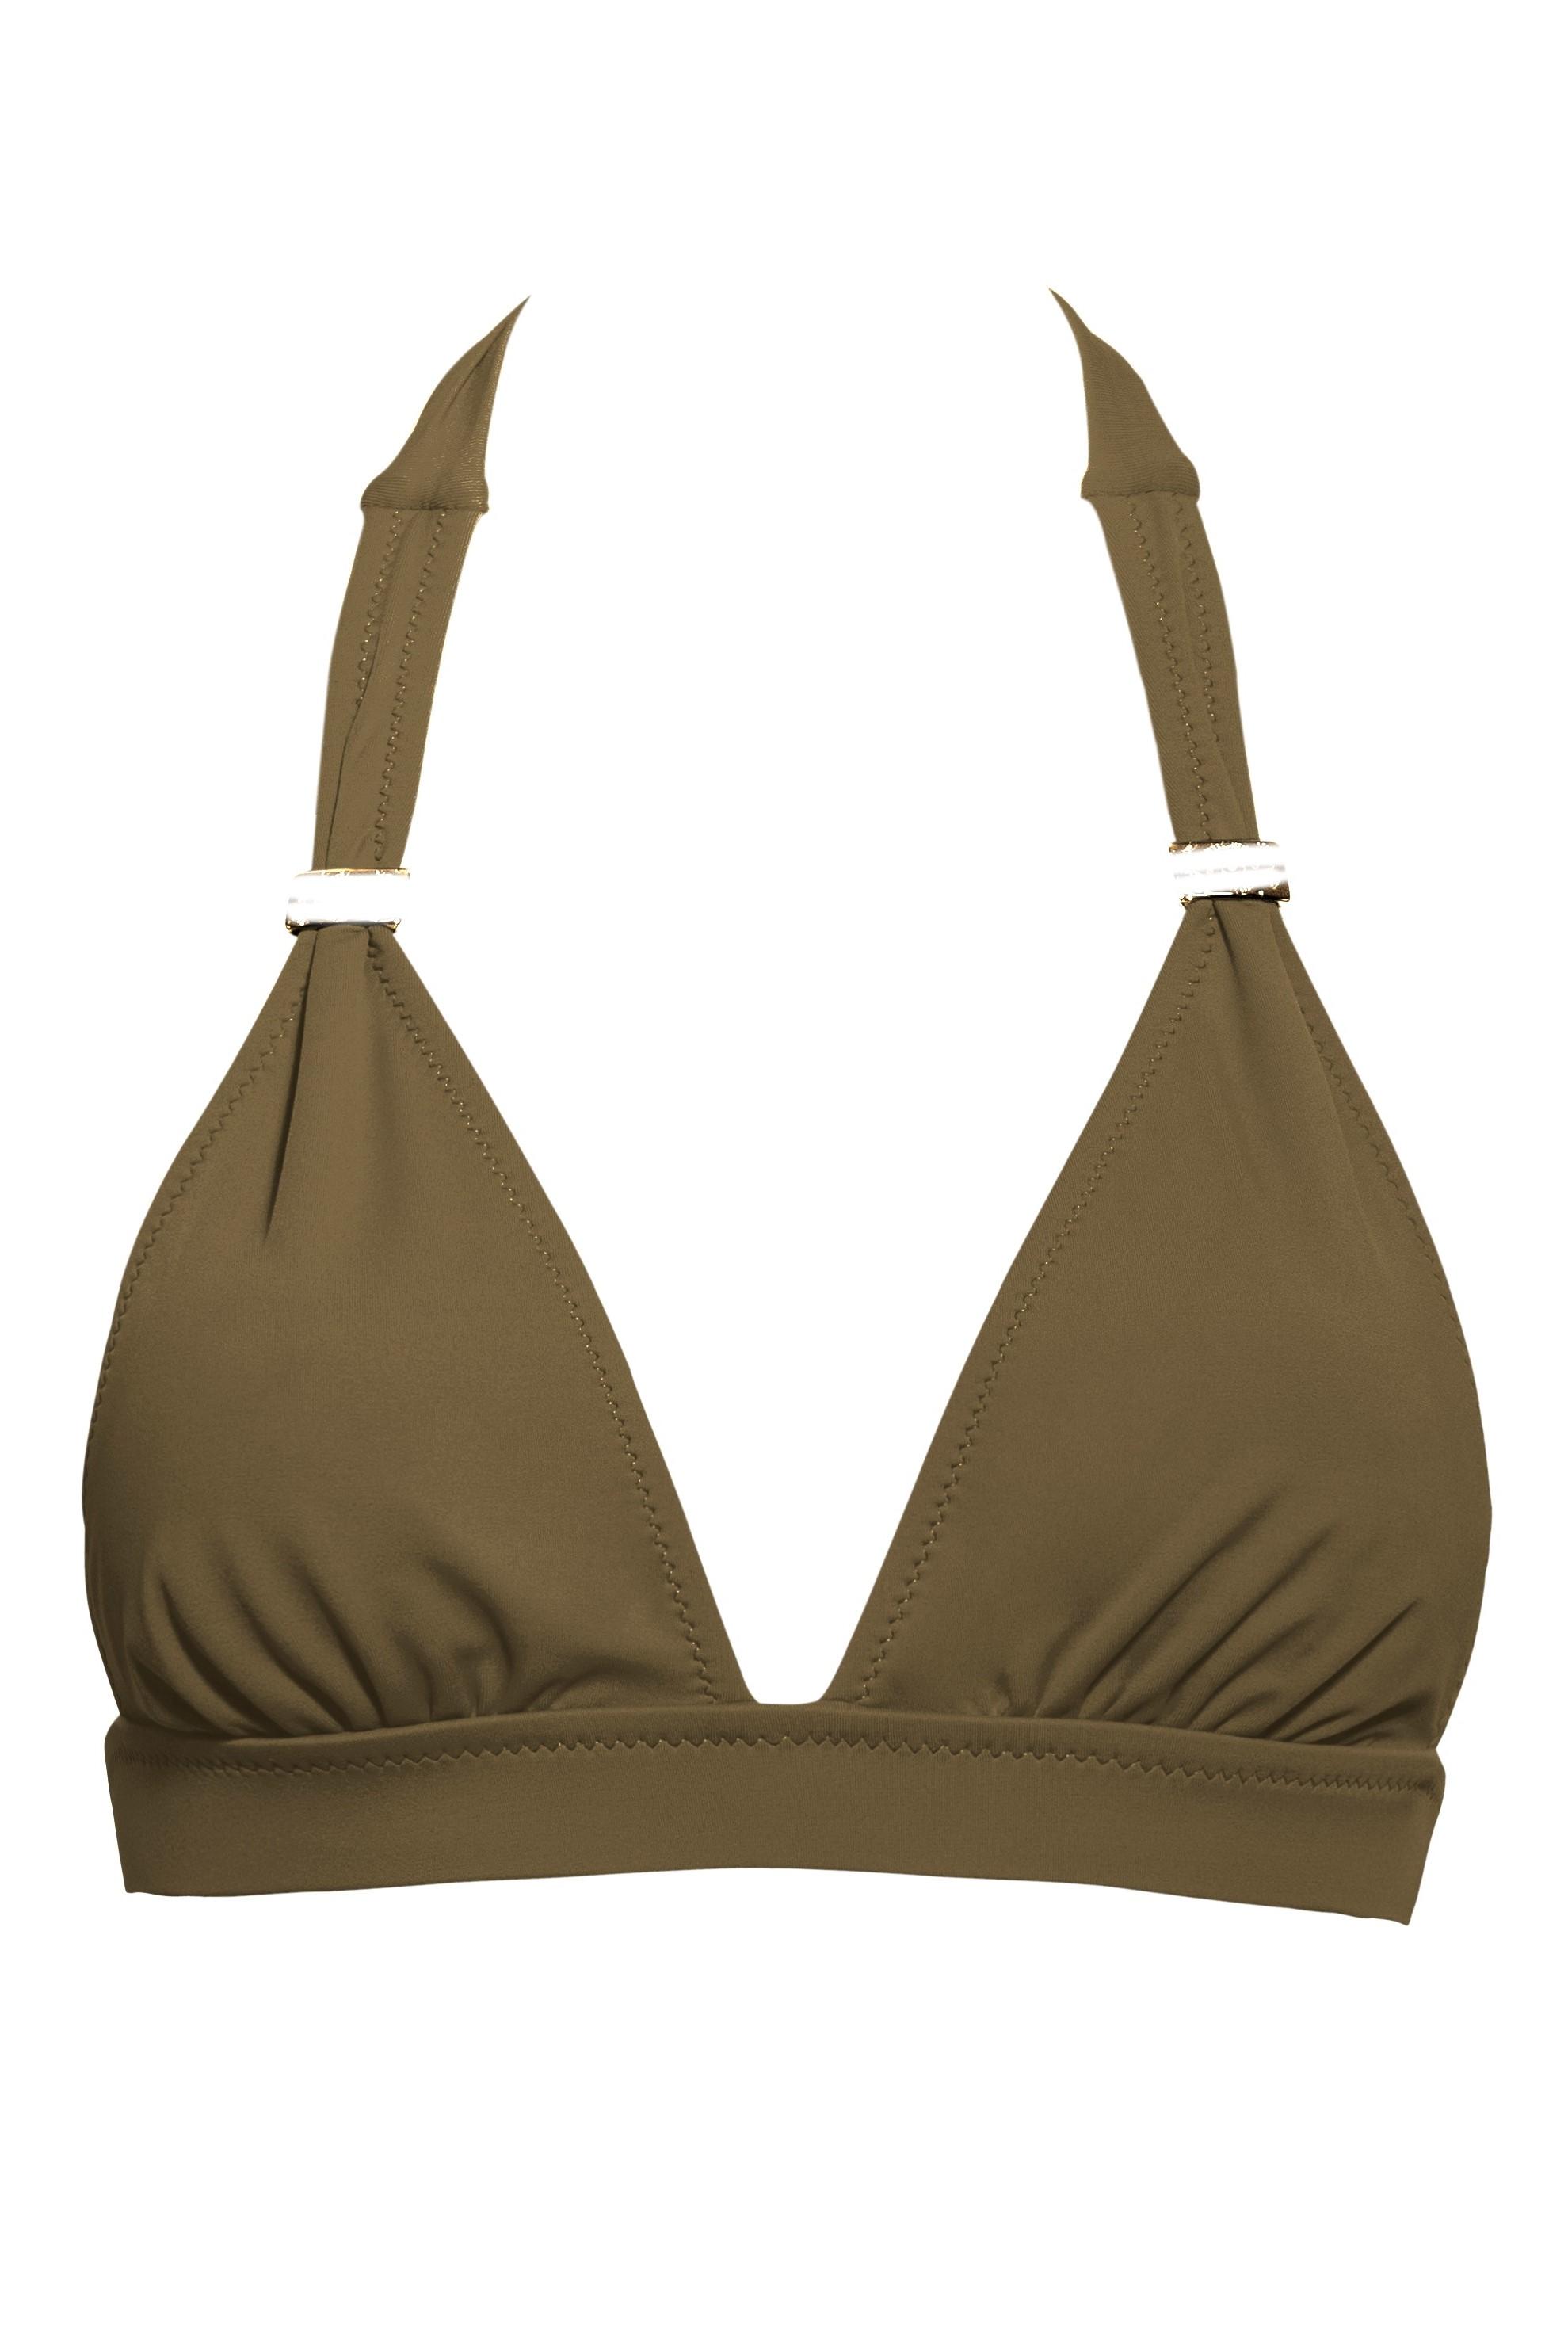 Phax Khaki Groene Halter Bikini Top